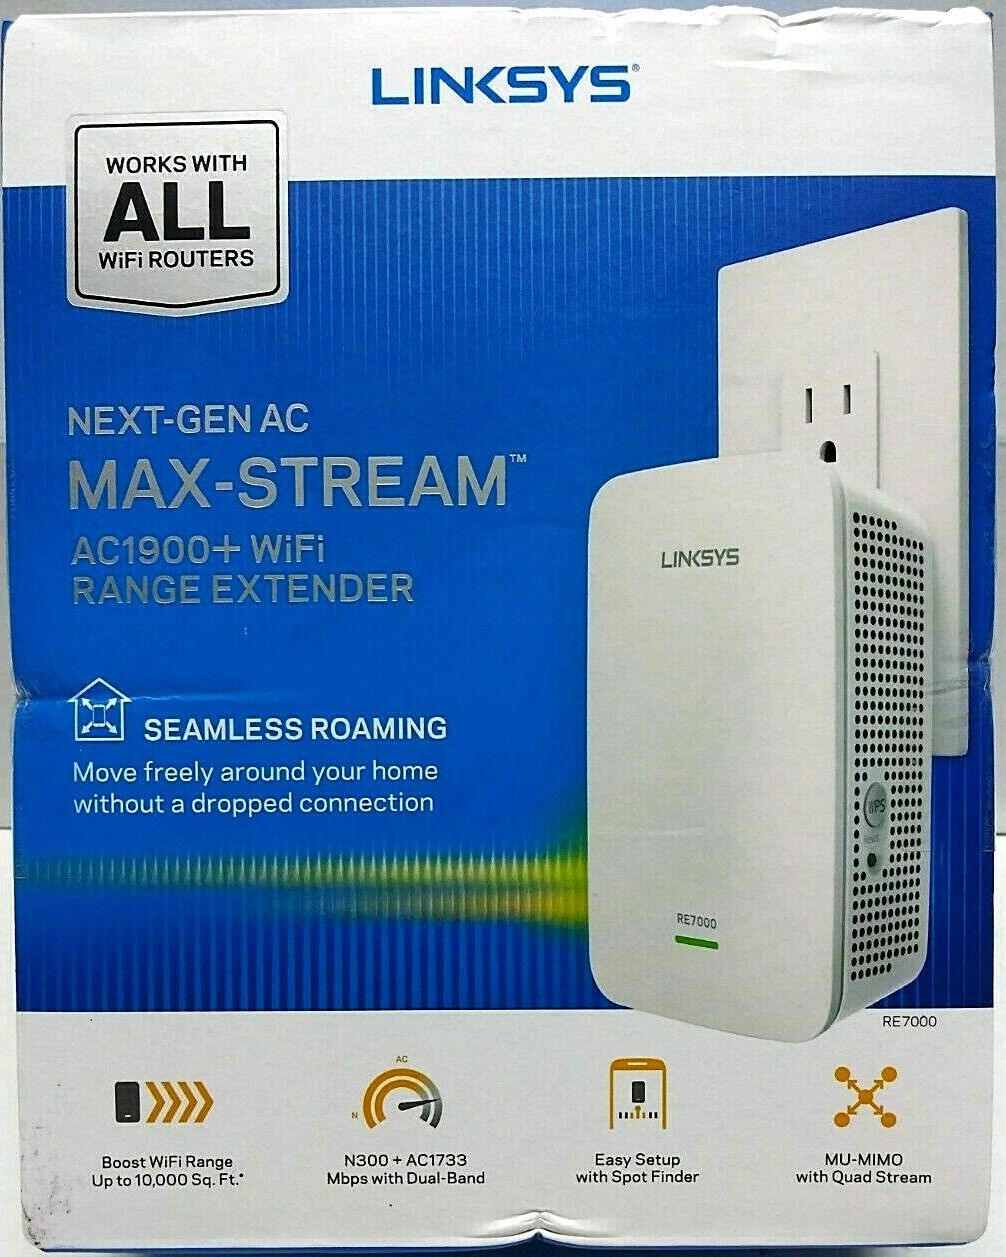 Linksys Max-Stream RE7000 IEEE 802.11ac 1.86 Gbit/s Wireless